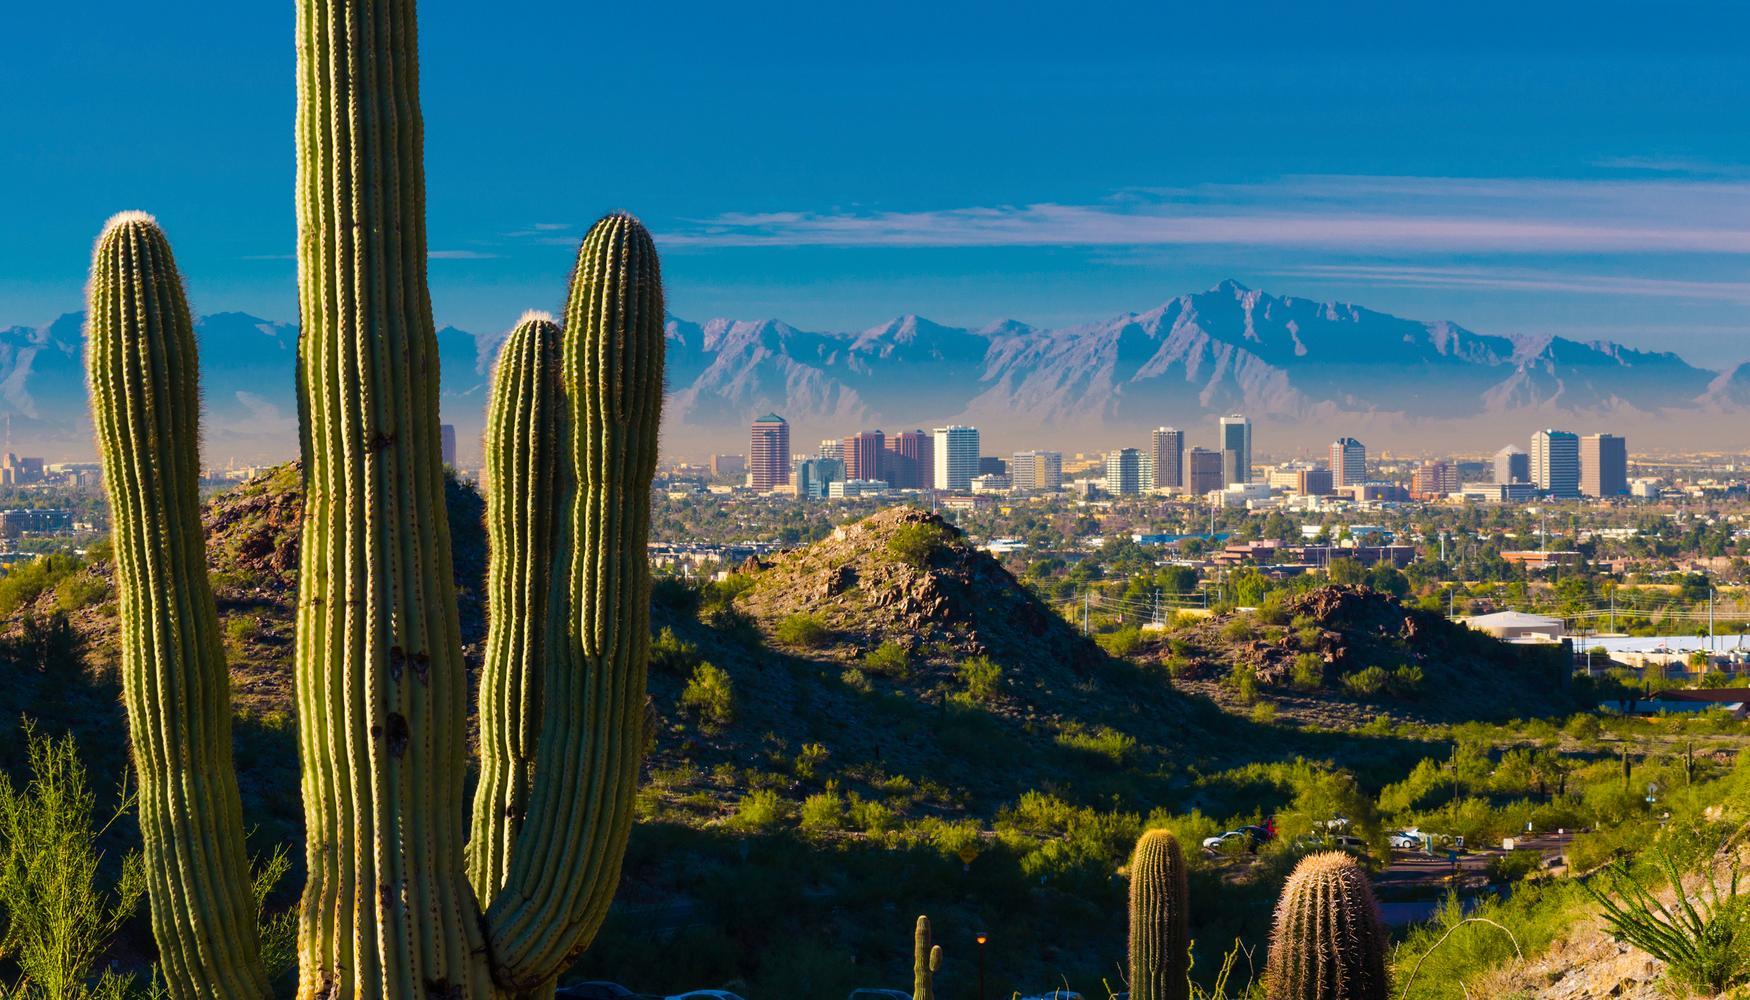 Enterprise Car Rentals In Phoenix From 18 Day Kayak